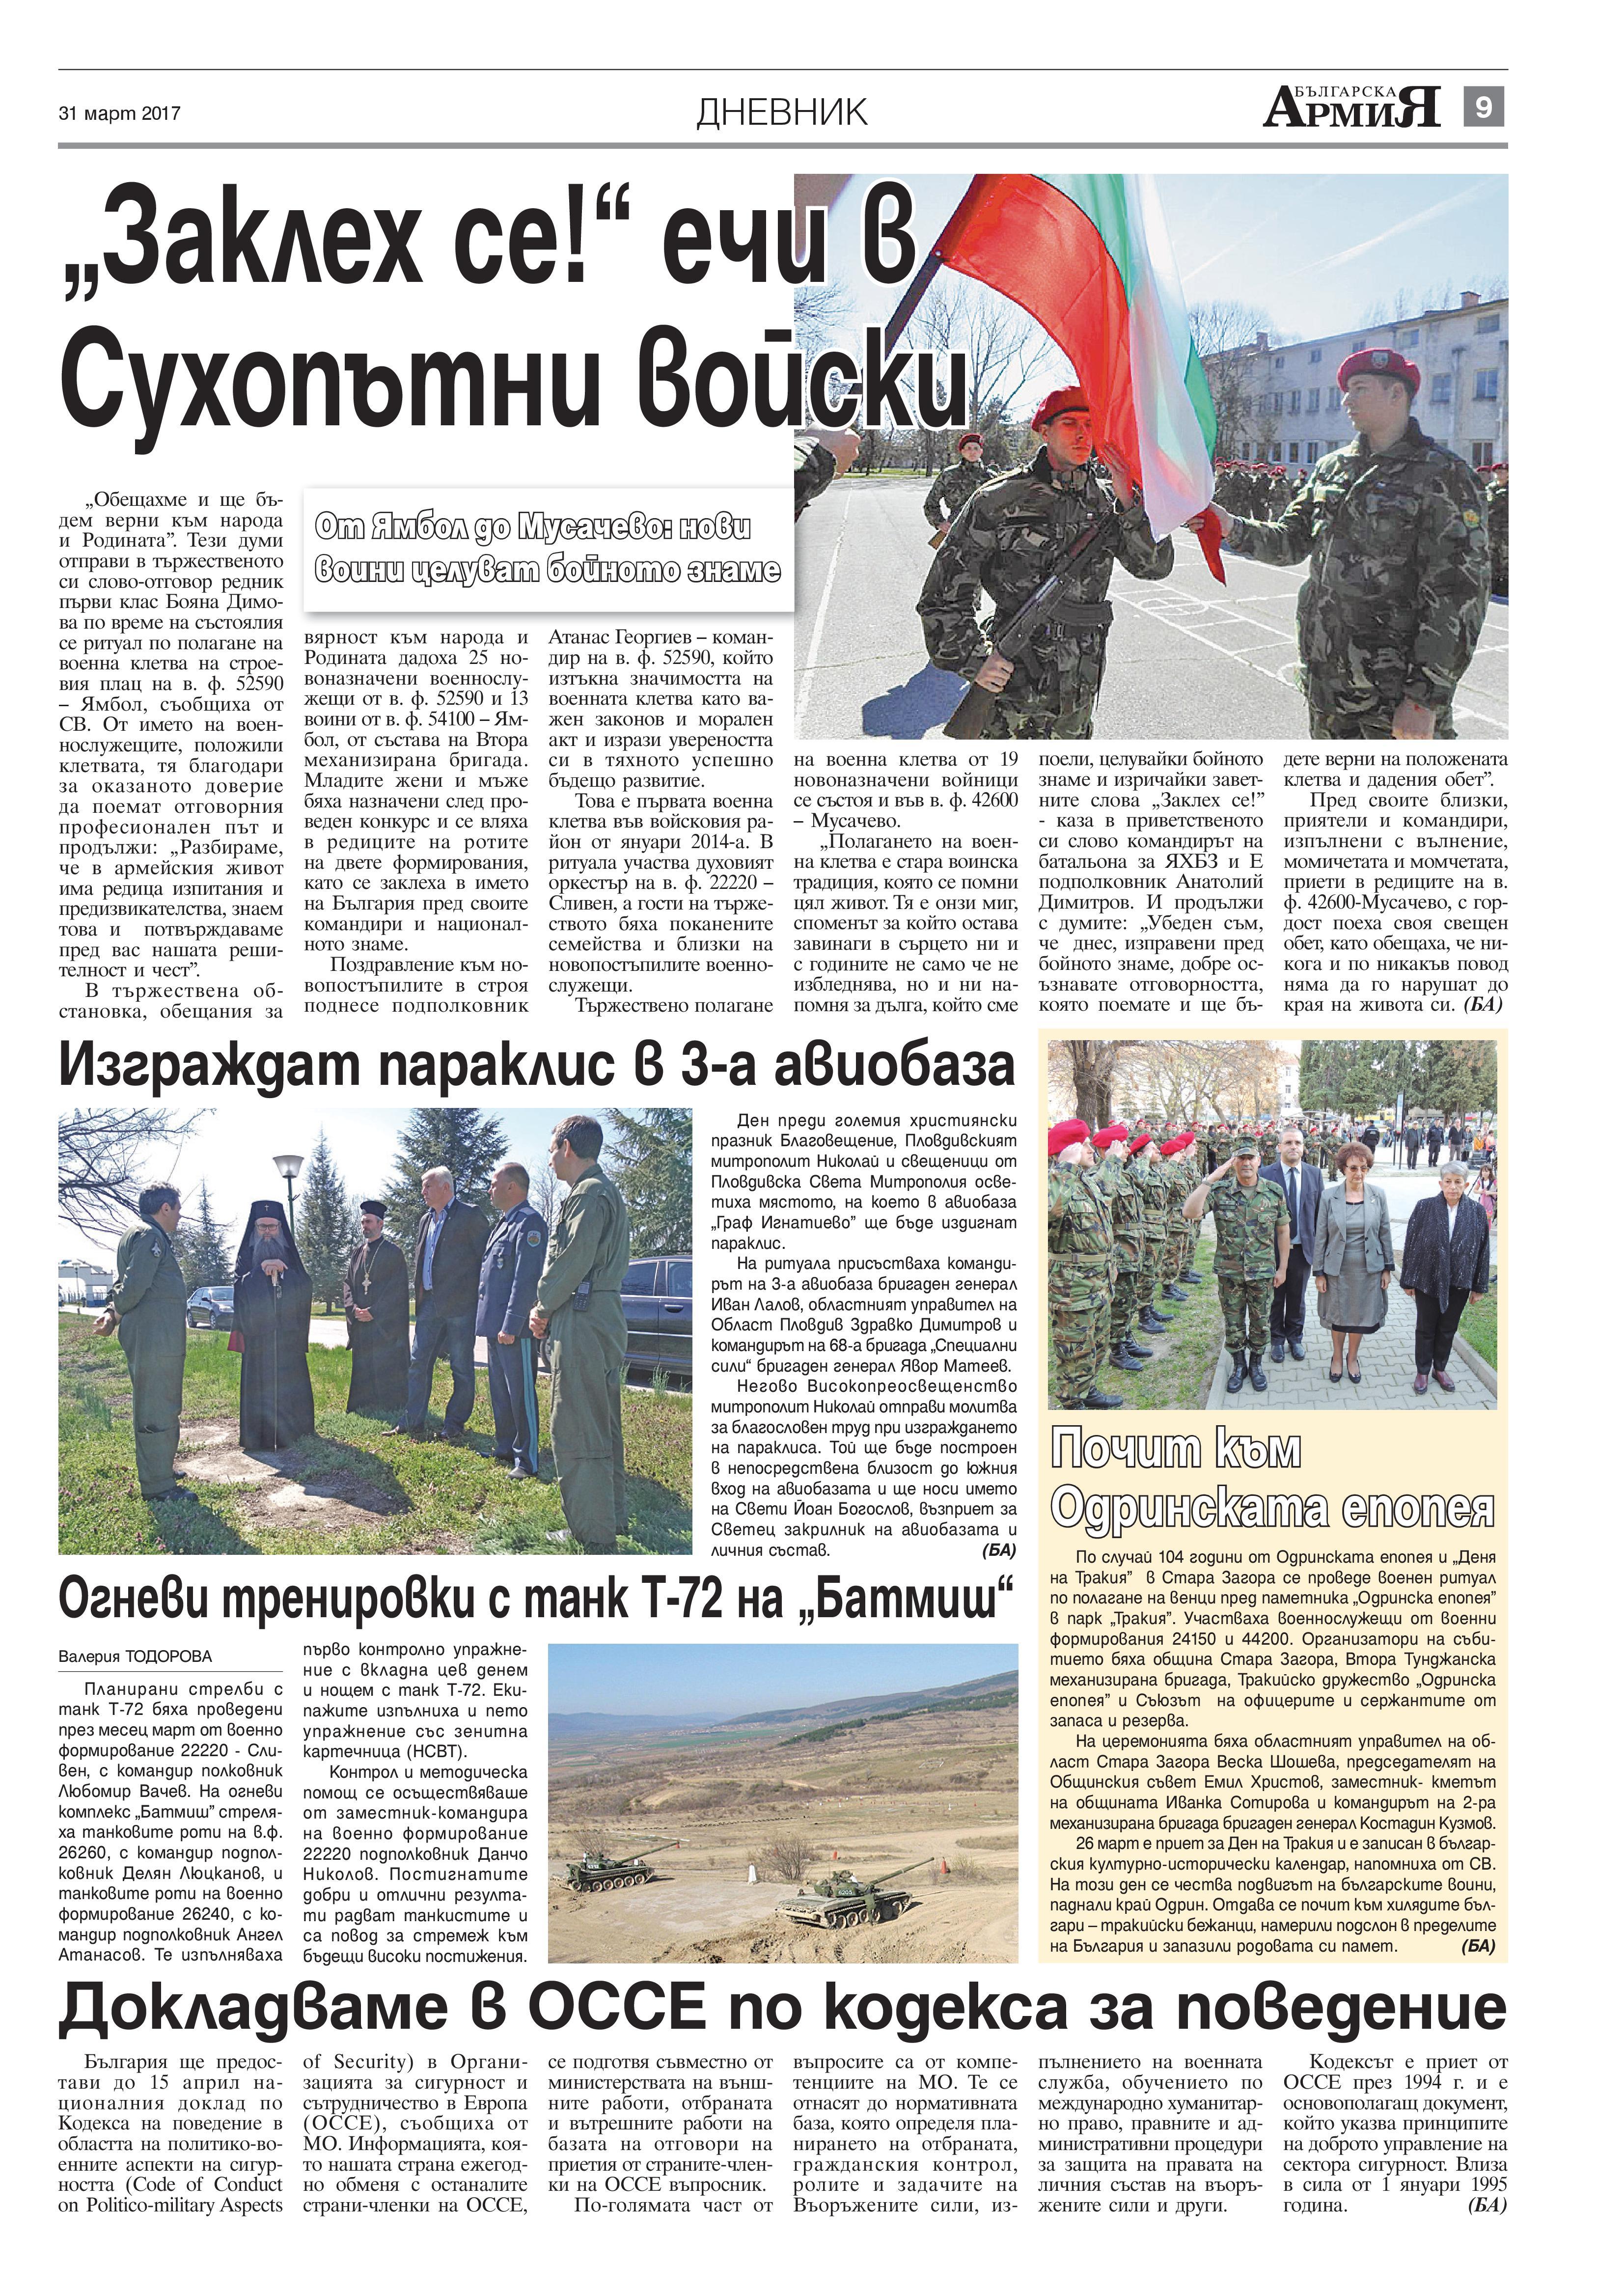 https://www.armymedia.bg/wp-content/uploads/2017/03/09-1.jpg